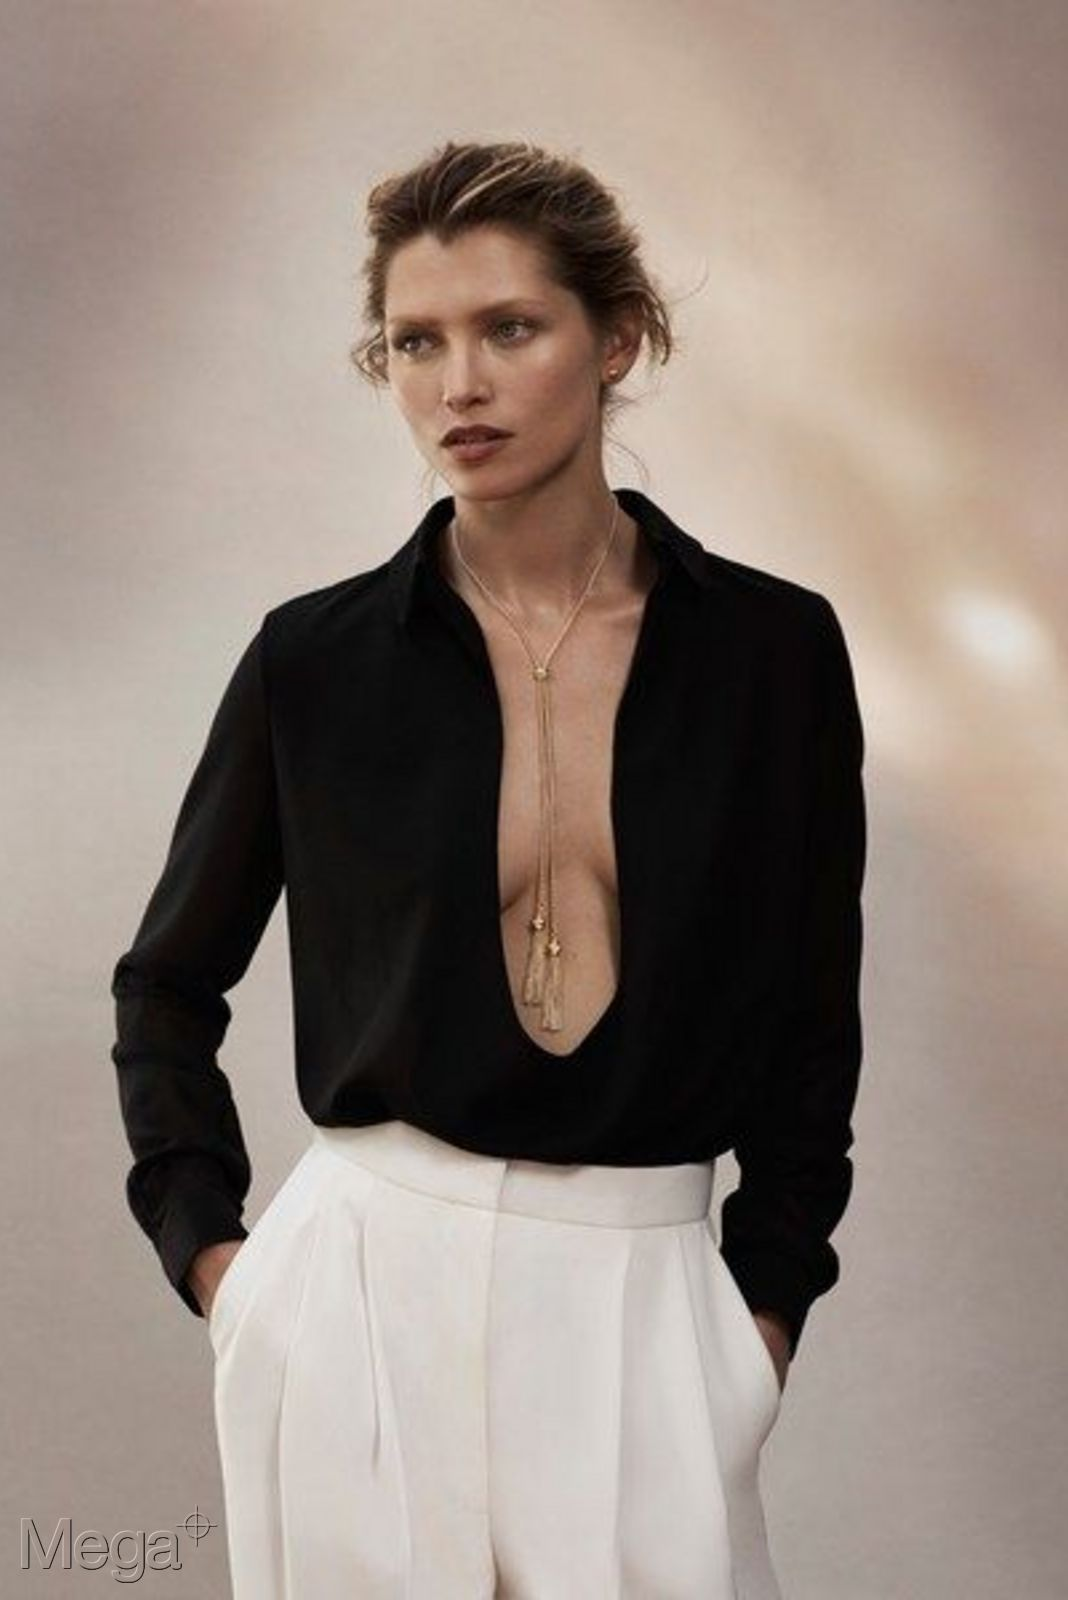 Fotos Hana Jirickova nudes (96 photos), Hot